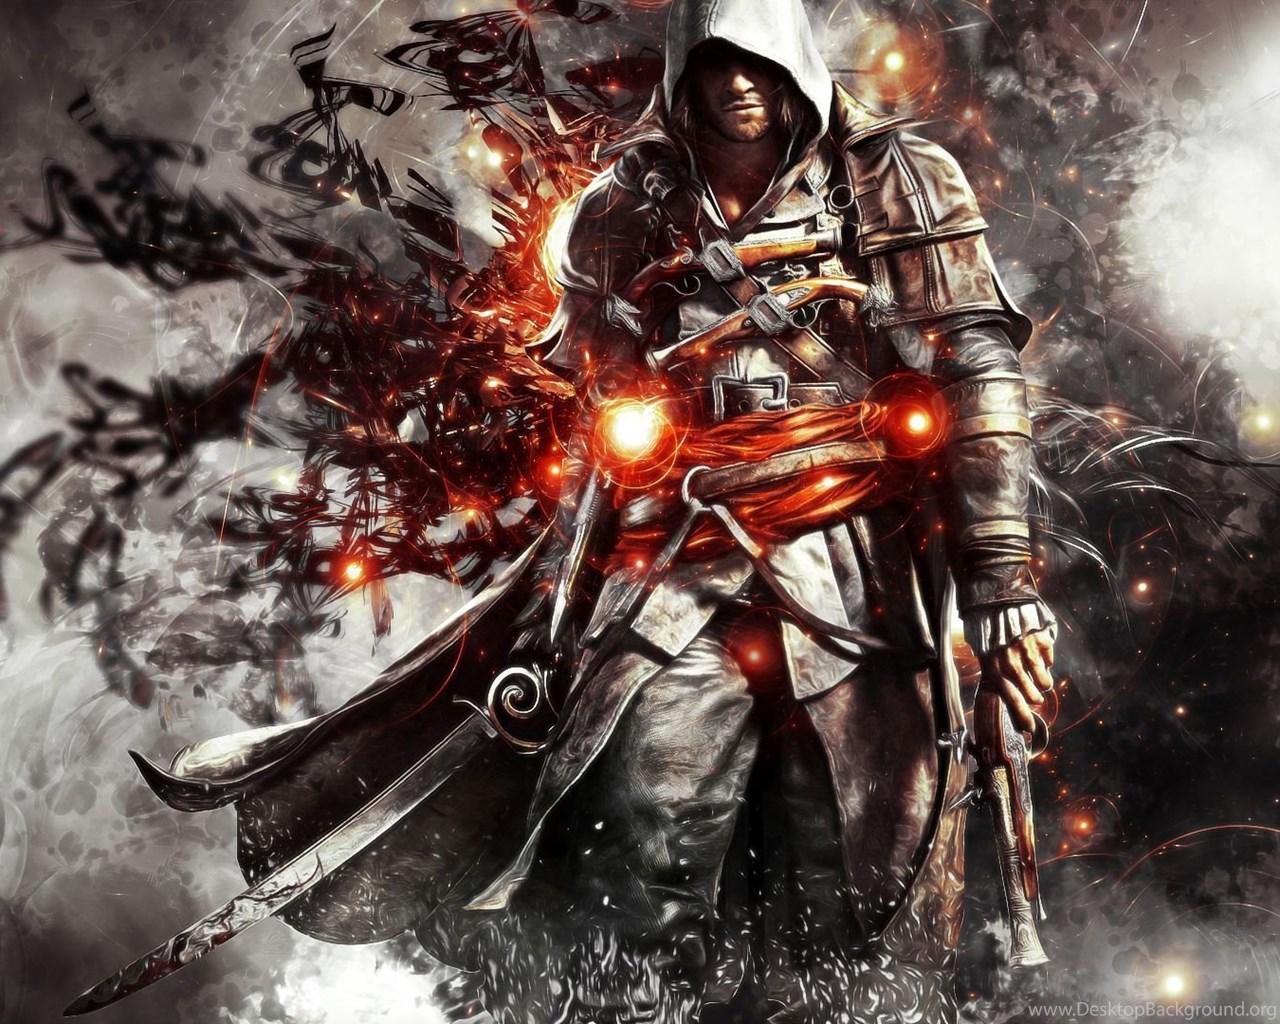 Assassins Creed Black Flag Characters Hd Wallpaper Hd Wallpaper